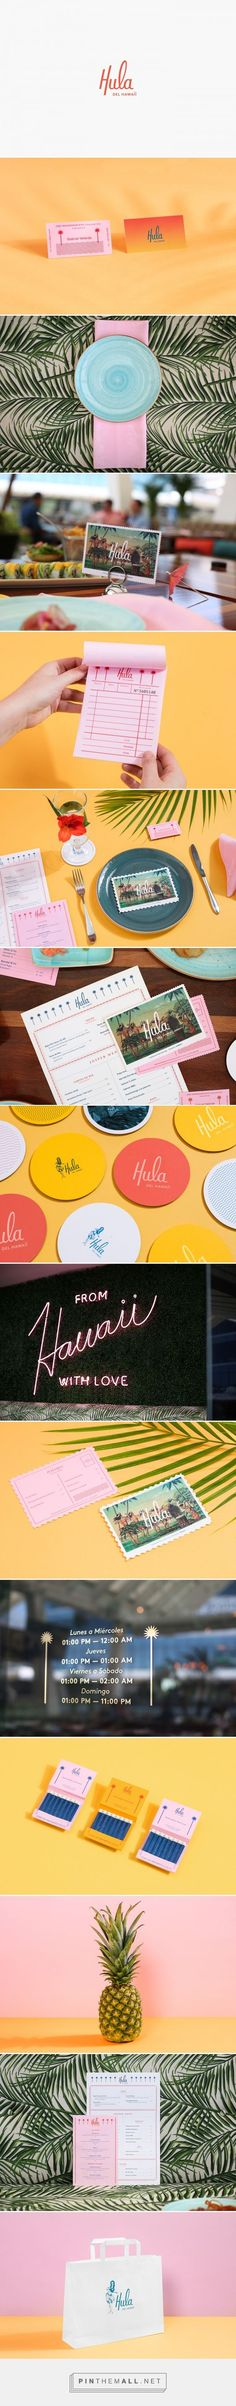 Hula Branding by Parametro Studio on Behance | Fivestar Branding – Design and Branding Agency & Inspiration Gallery